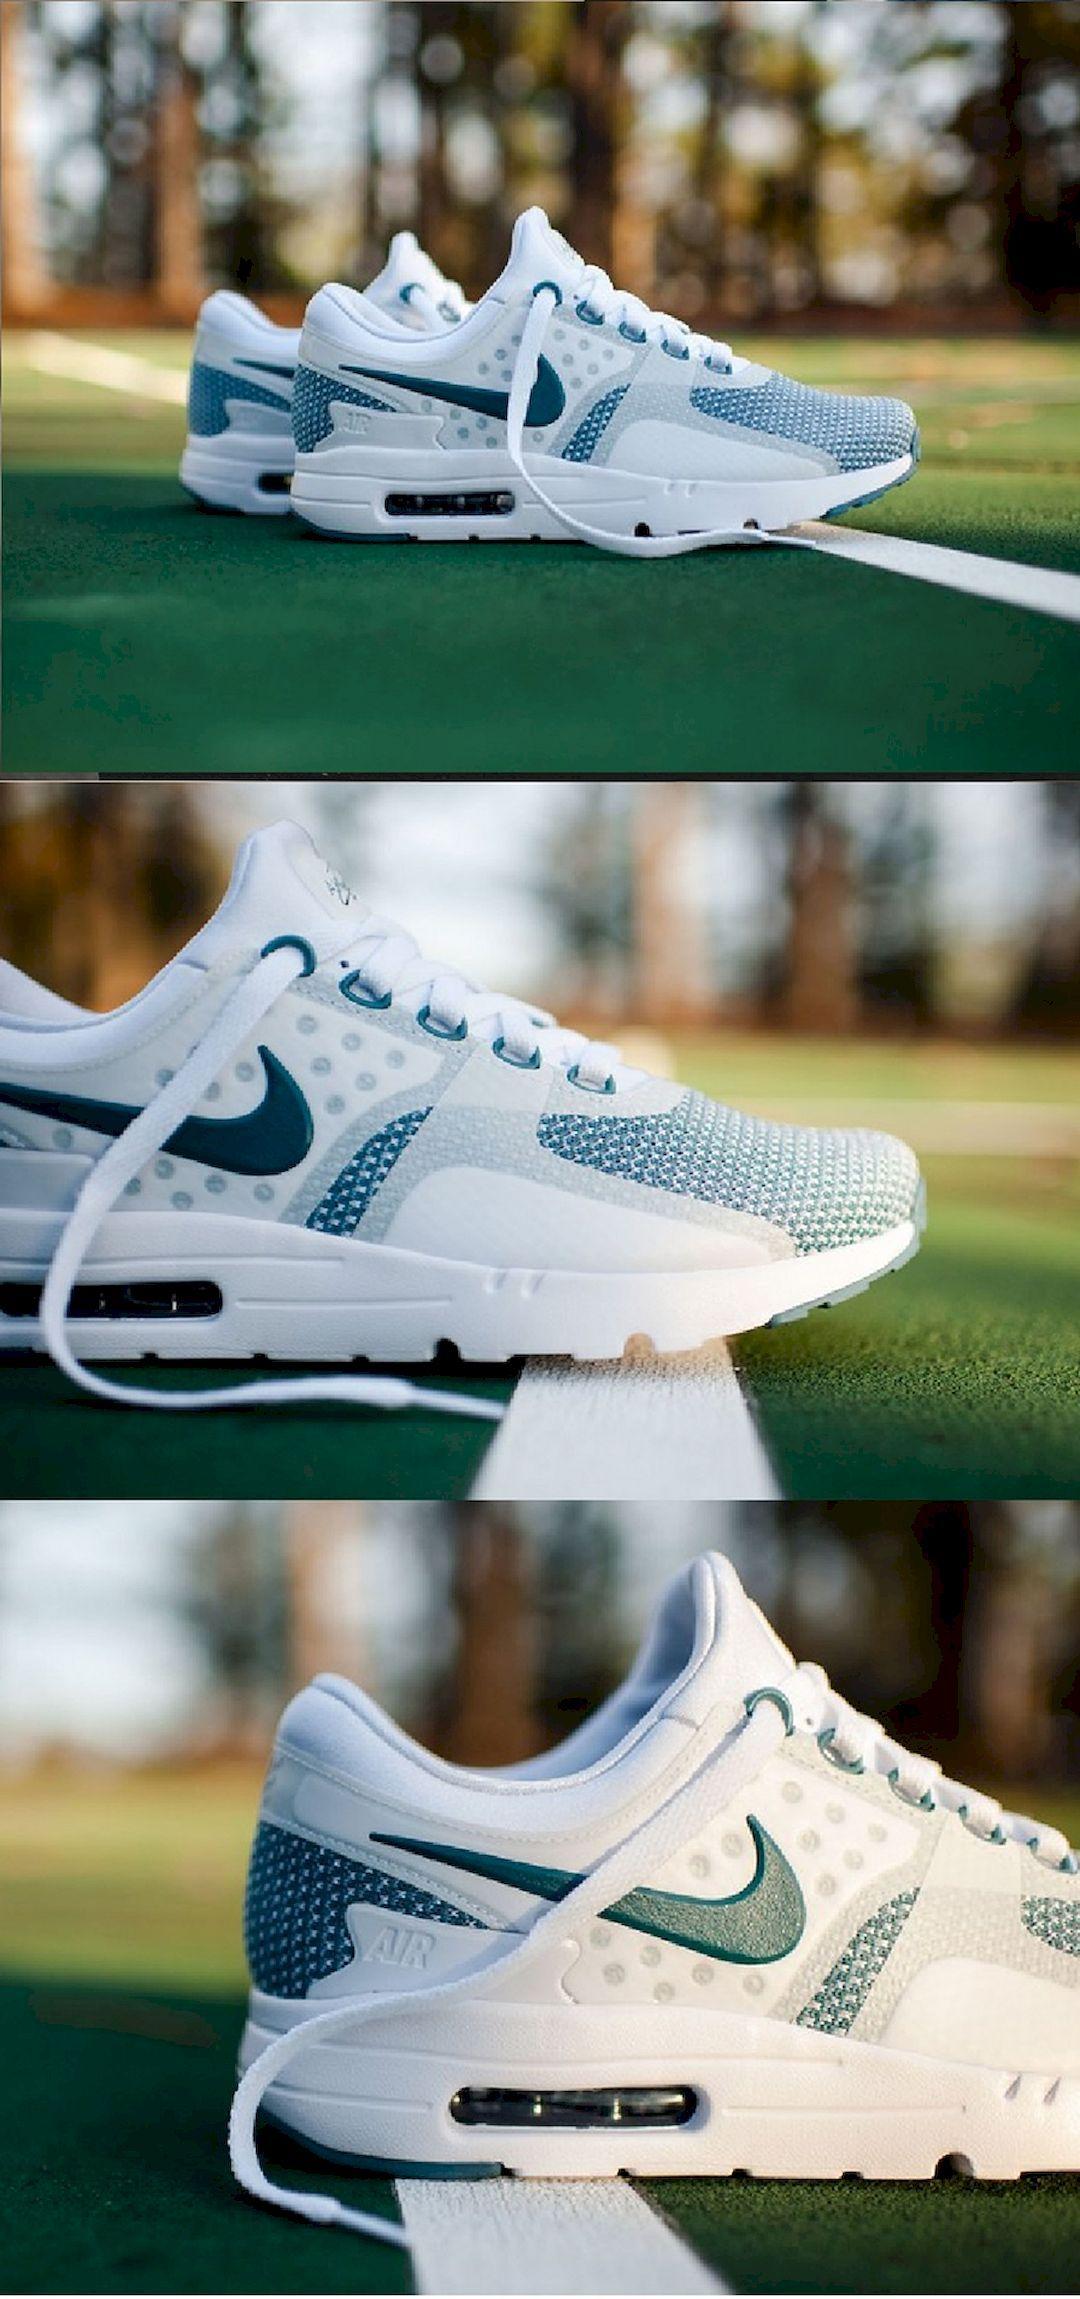 Air Max Day 2017: The Best 221 Nike Designs   Nike schuhe